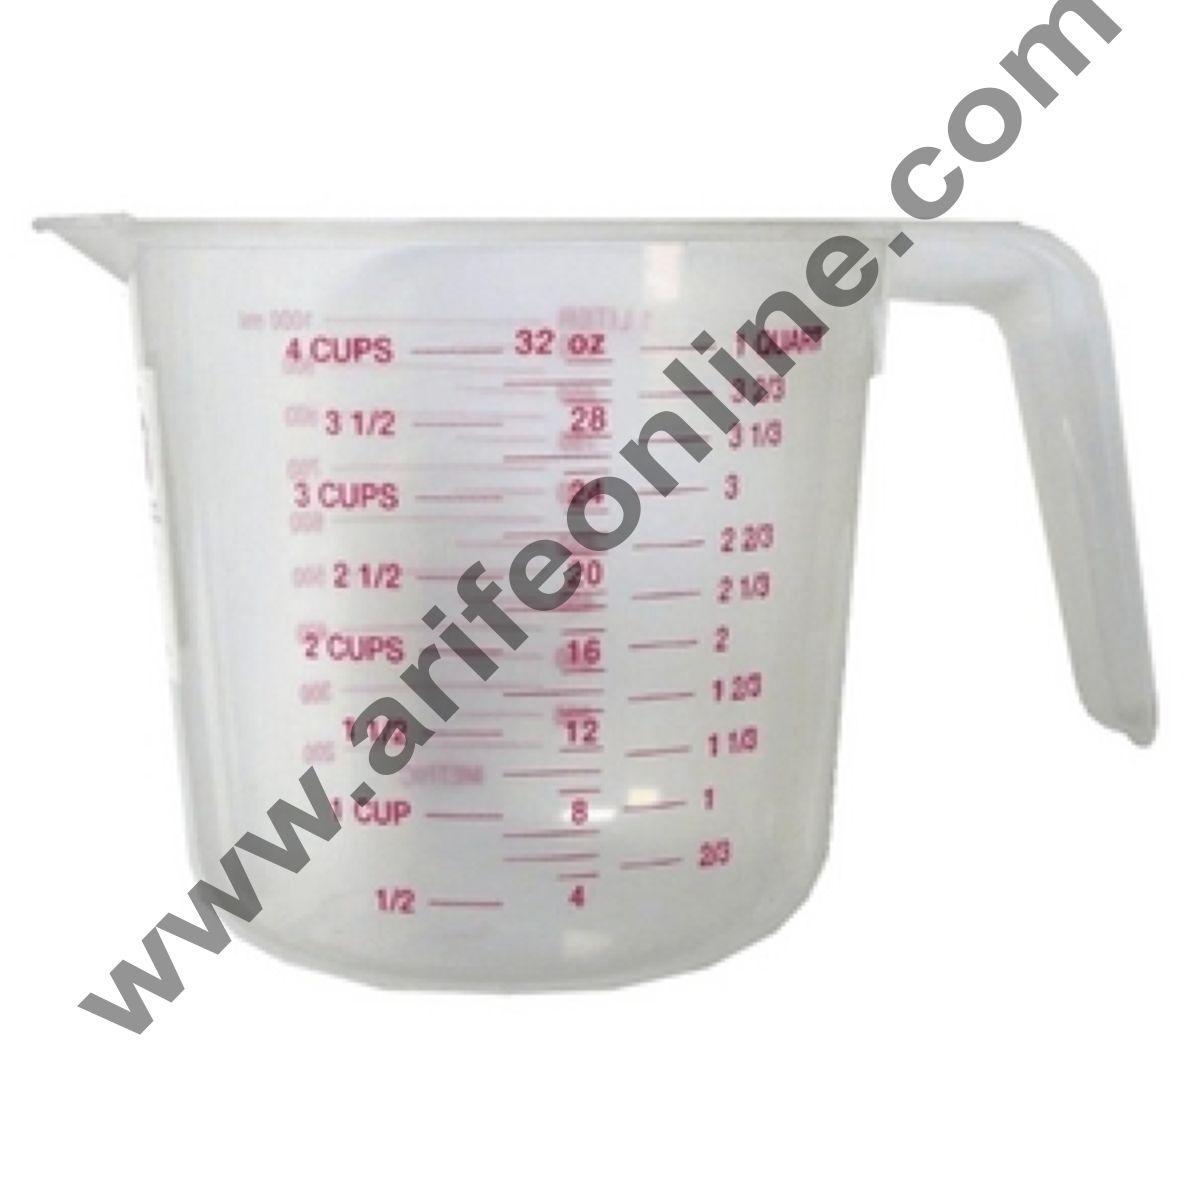 Cake Decor Plastic Measuring Jar 1Ltr. Litre, Cups, Grams